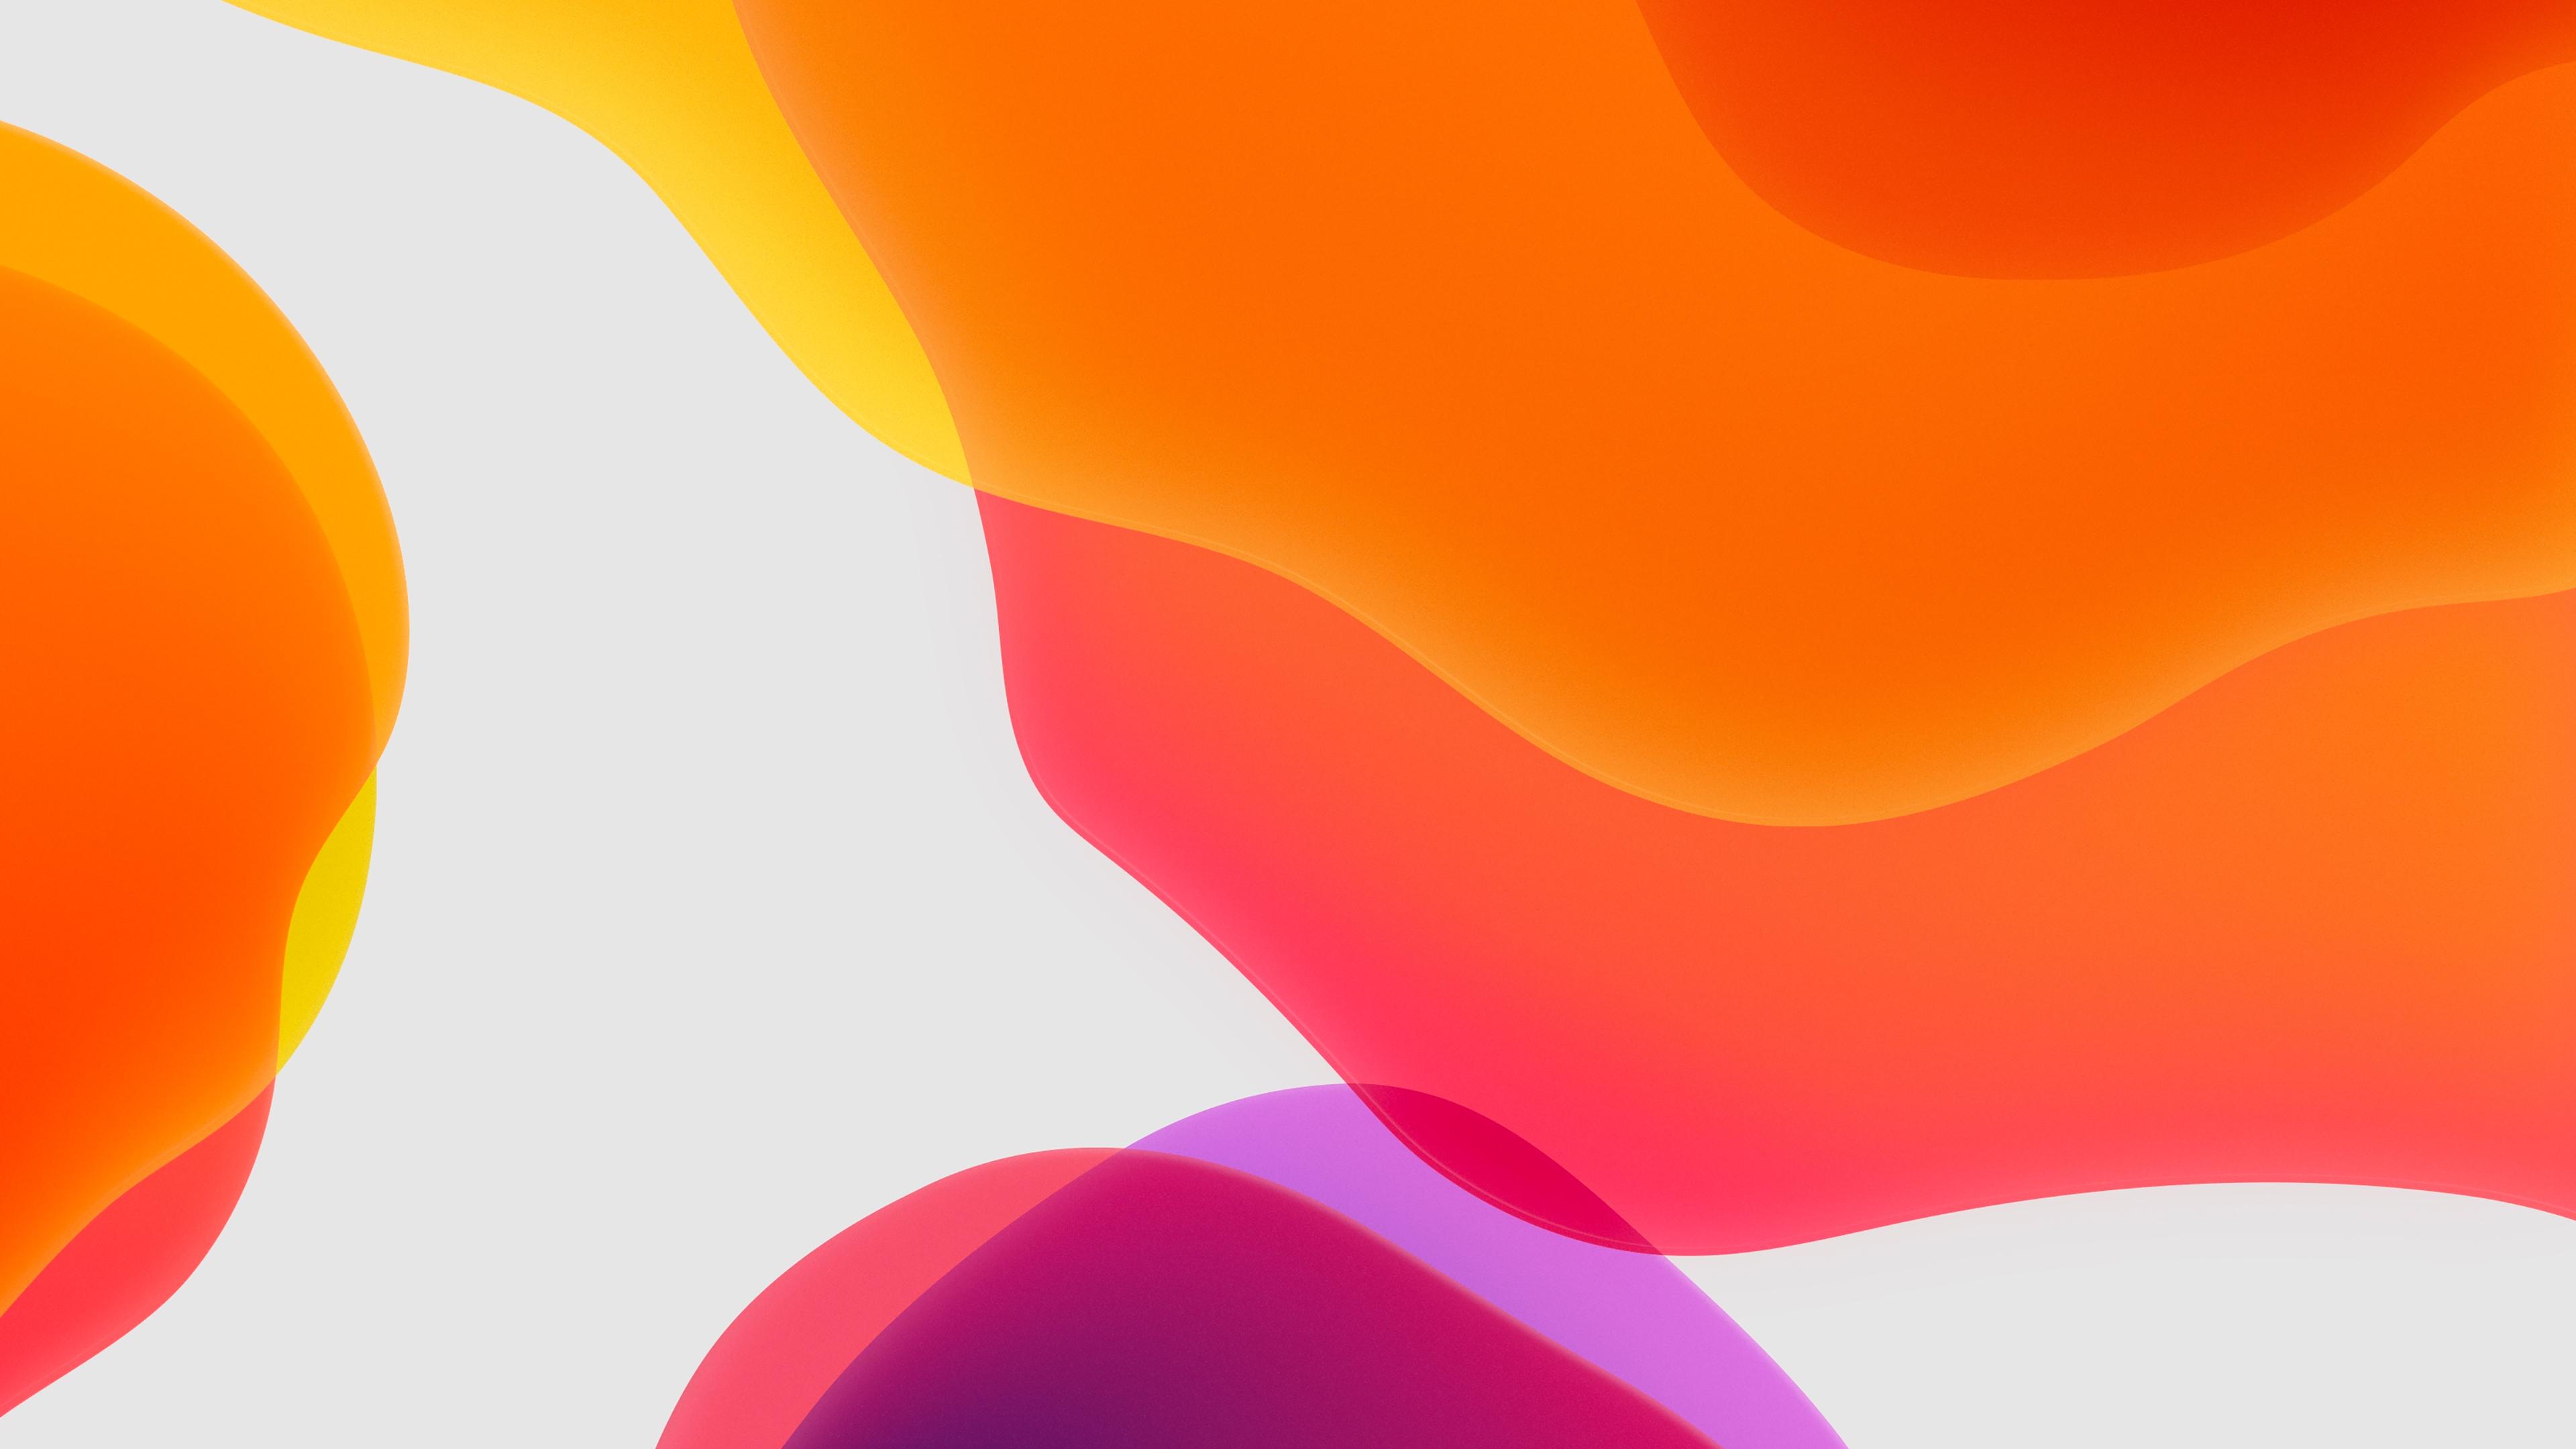 iOS 13 iPadOS Orange Wallpapers   HD Wallpapers